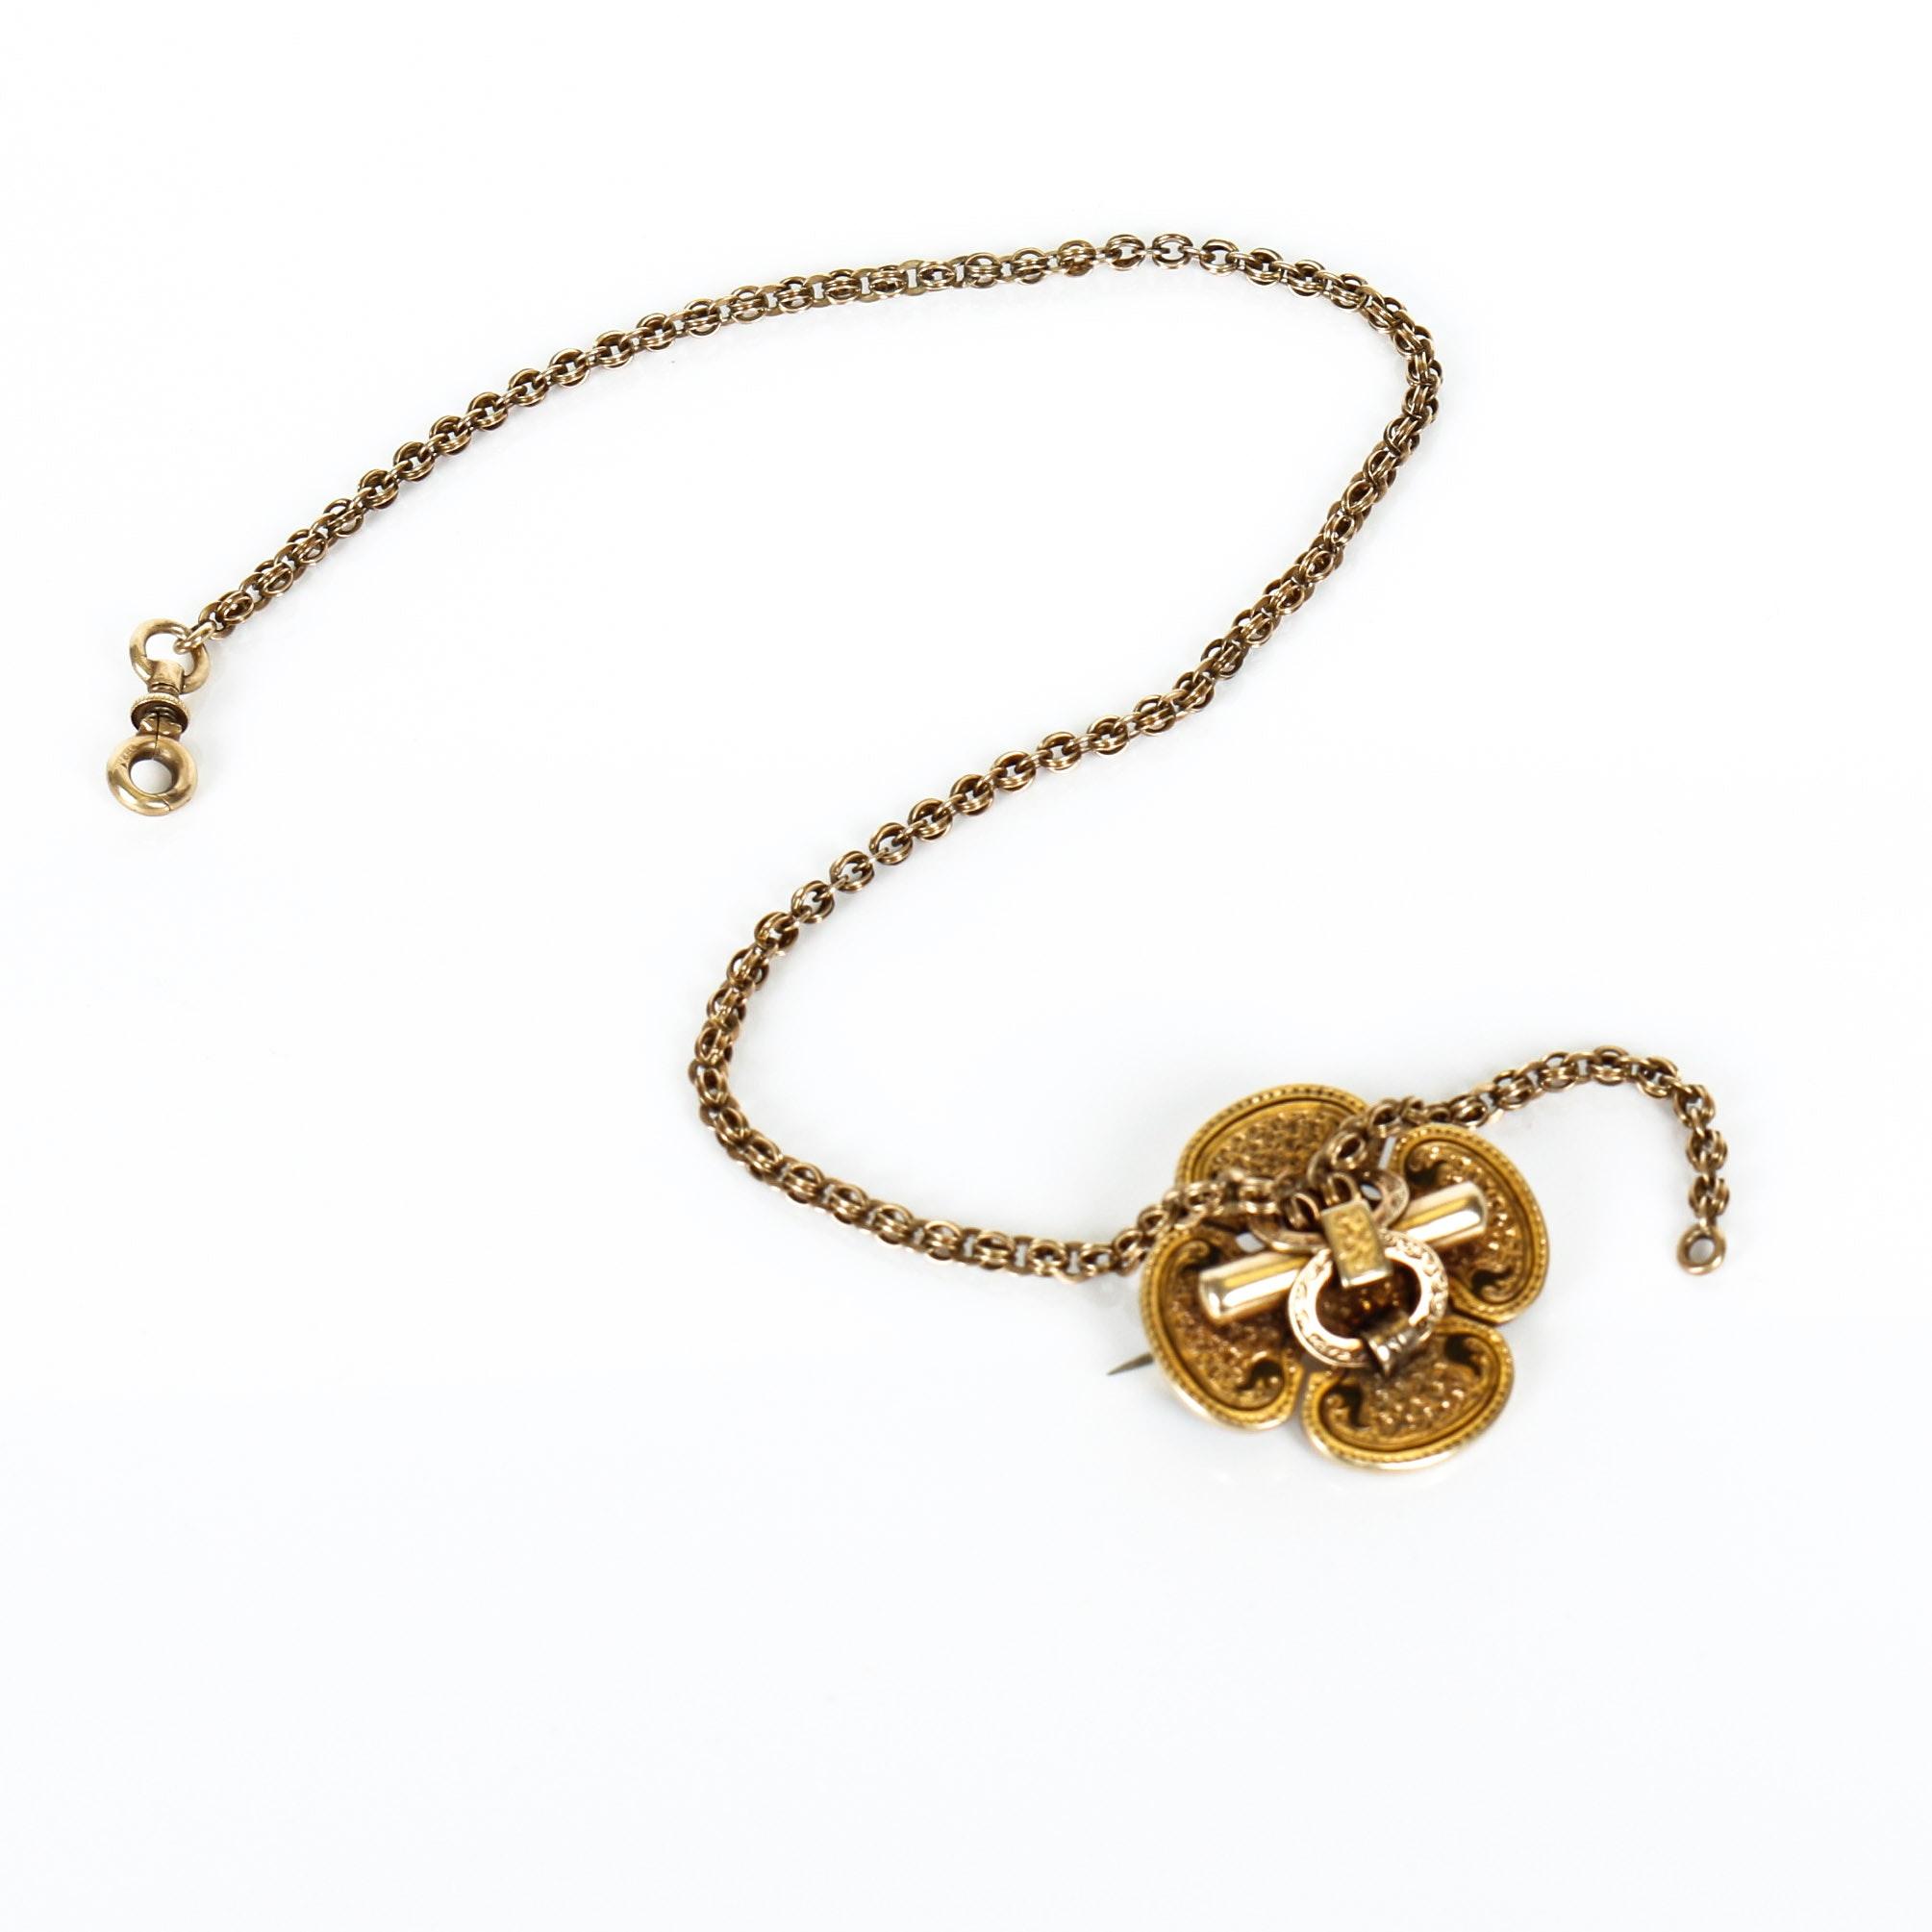 14K Gold Victorian Quatrefoil Watch Chain with Enamel Detailing